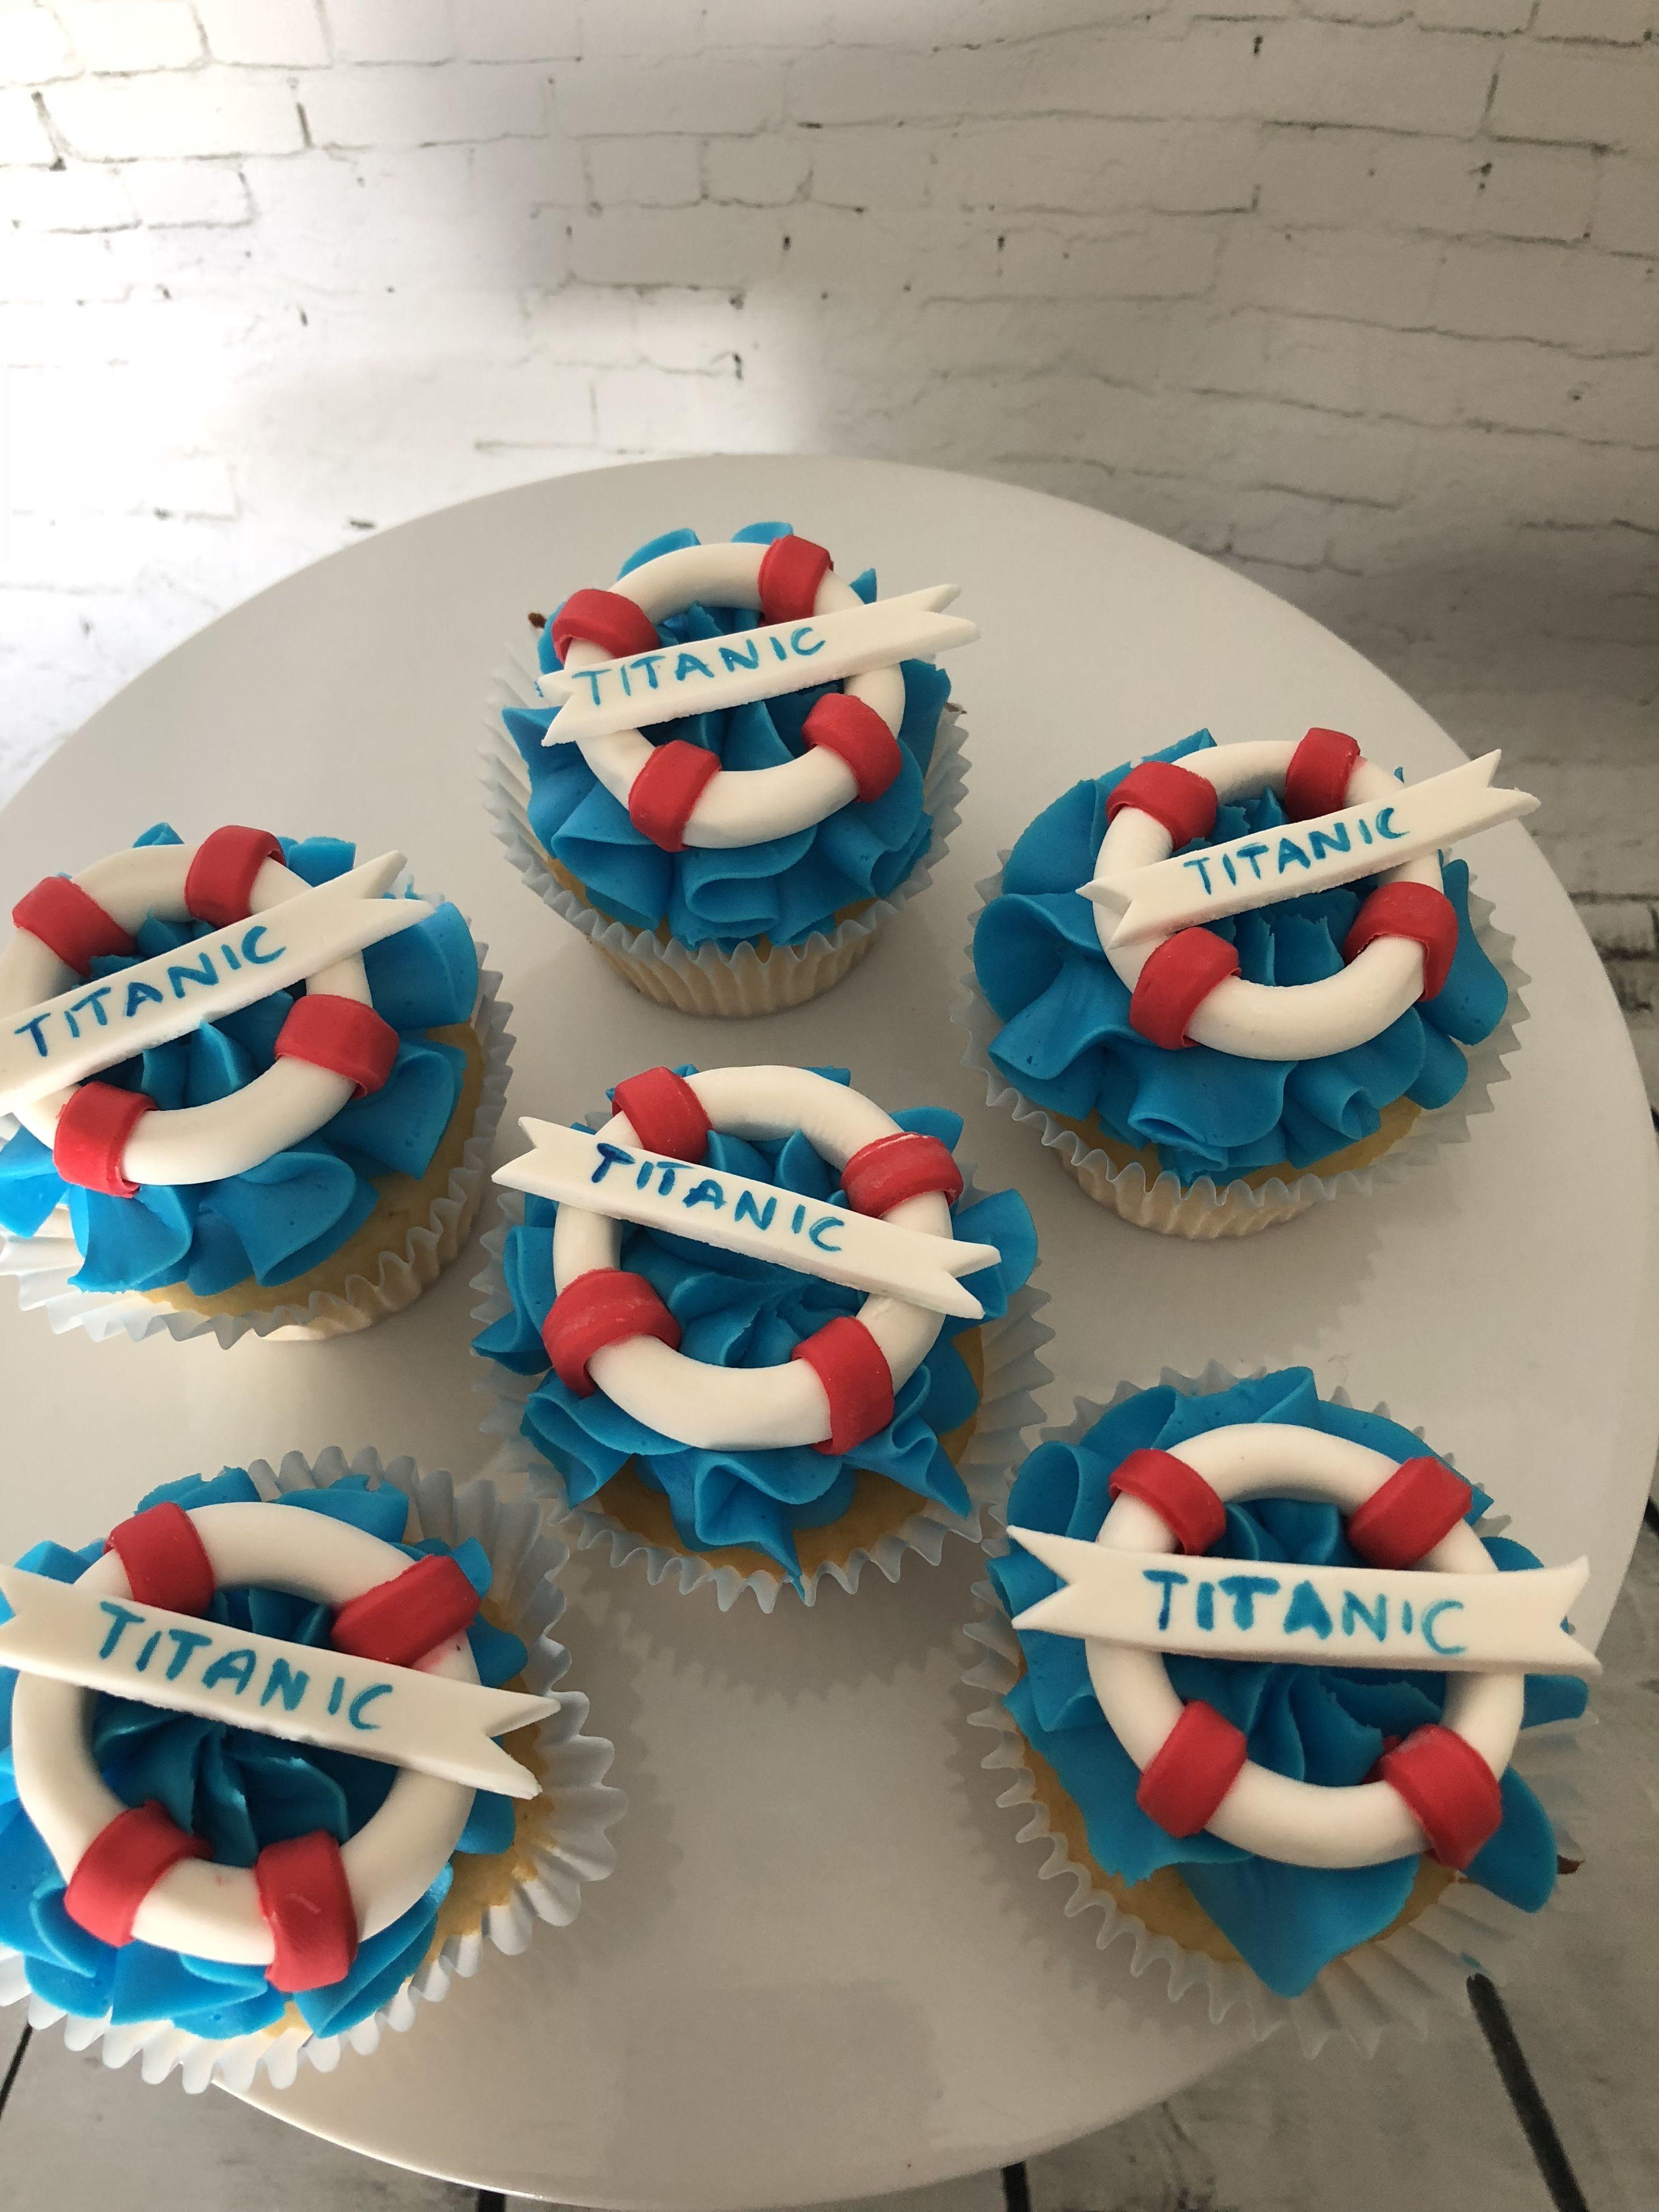 Titanic Cupcake Toppers